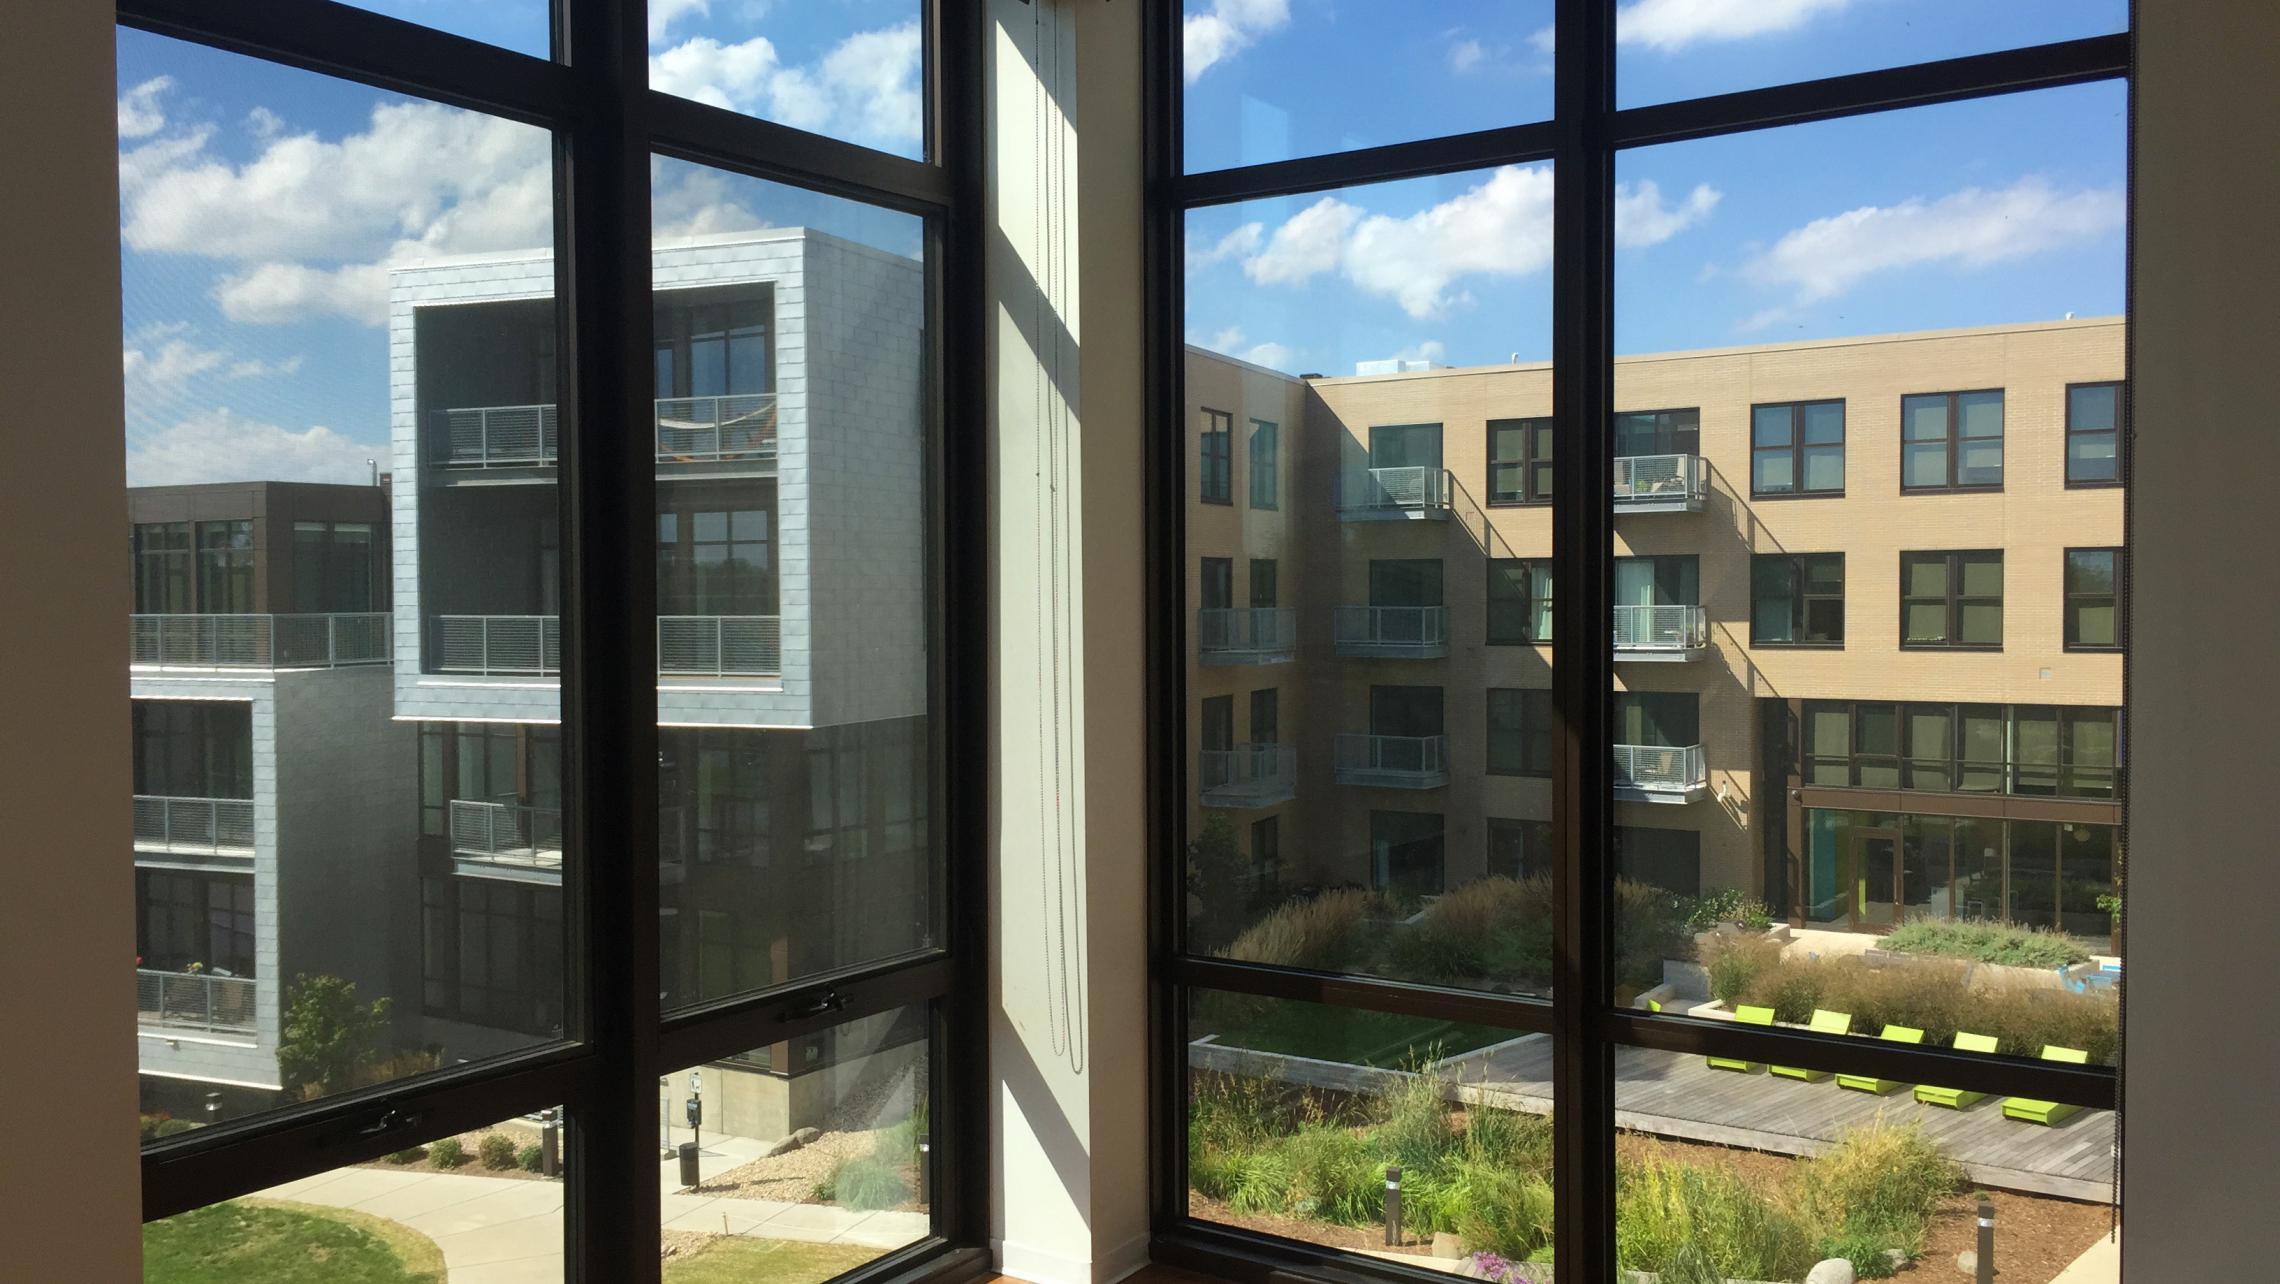 ULI Seven27 Apartment 339 - Bedroom Windows